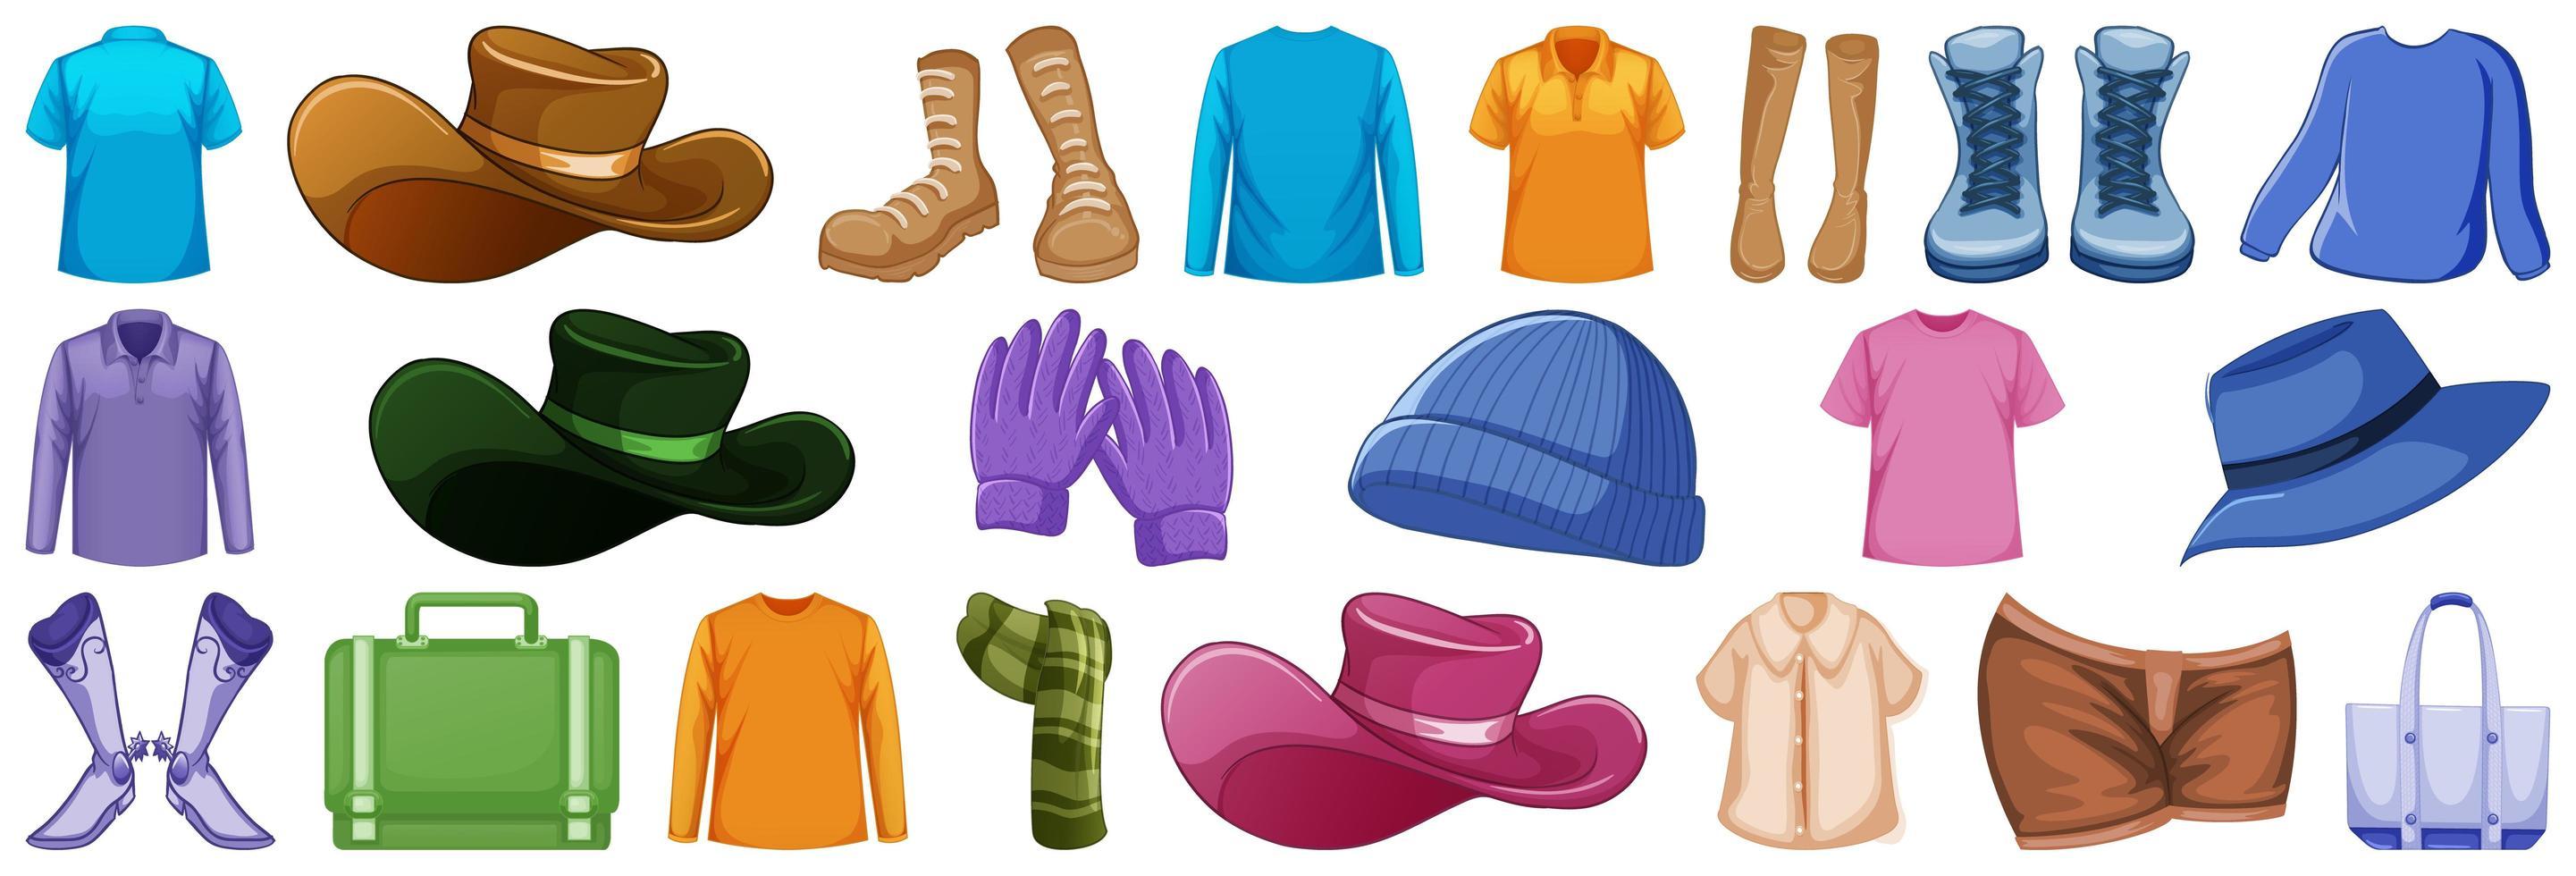 set mode-accessoires en kleding vector